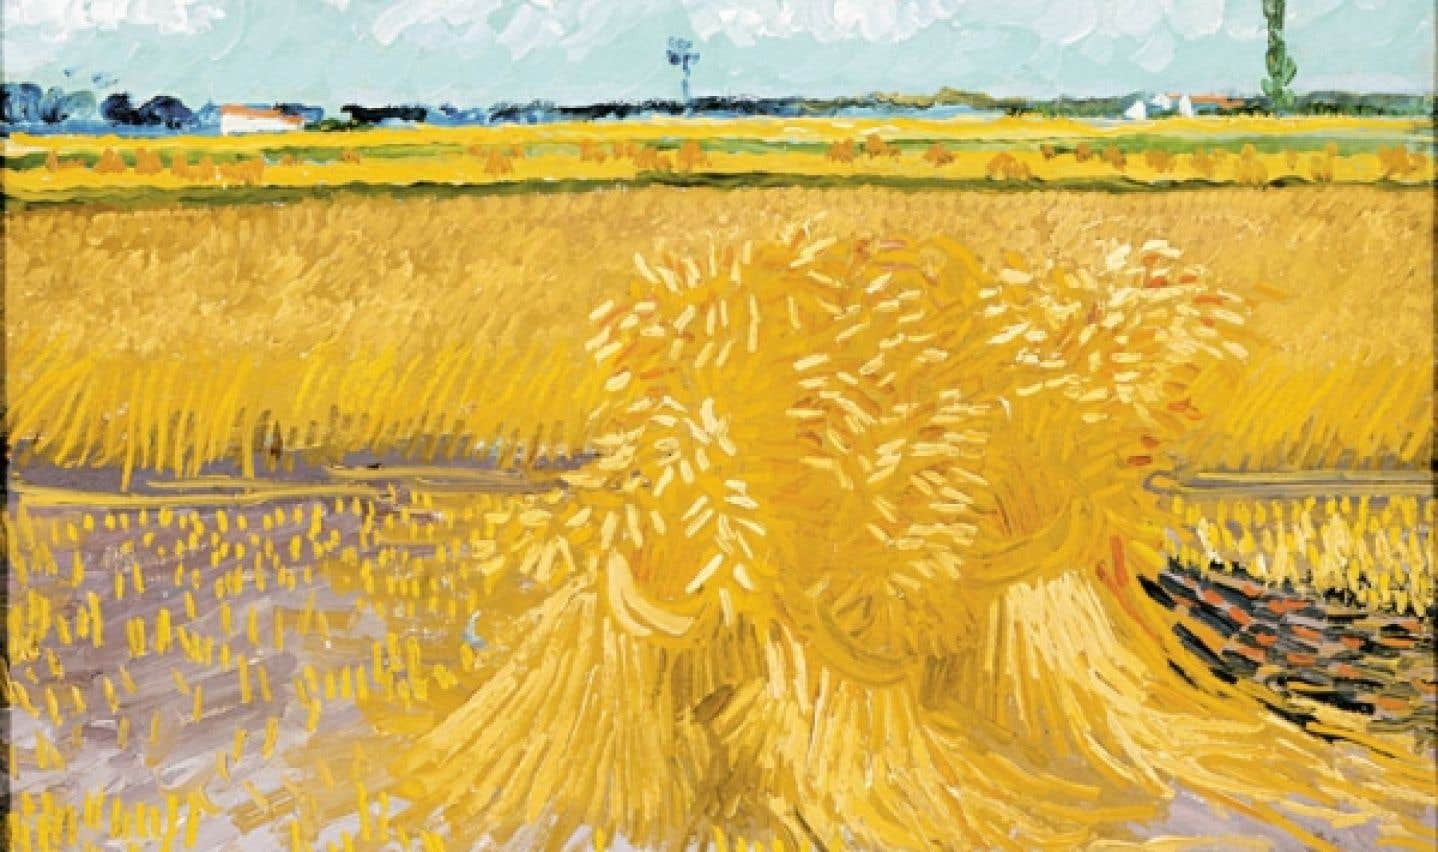 Van Gogh, Champ de blé avec gerbes, 1888